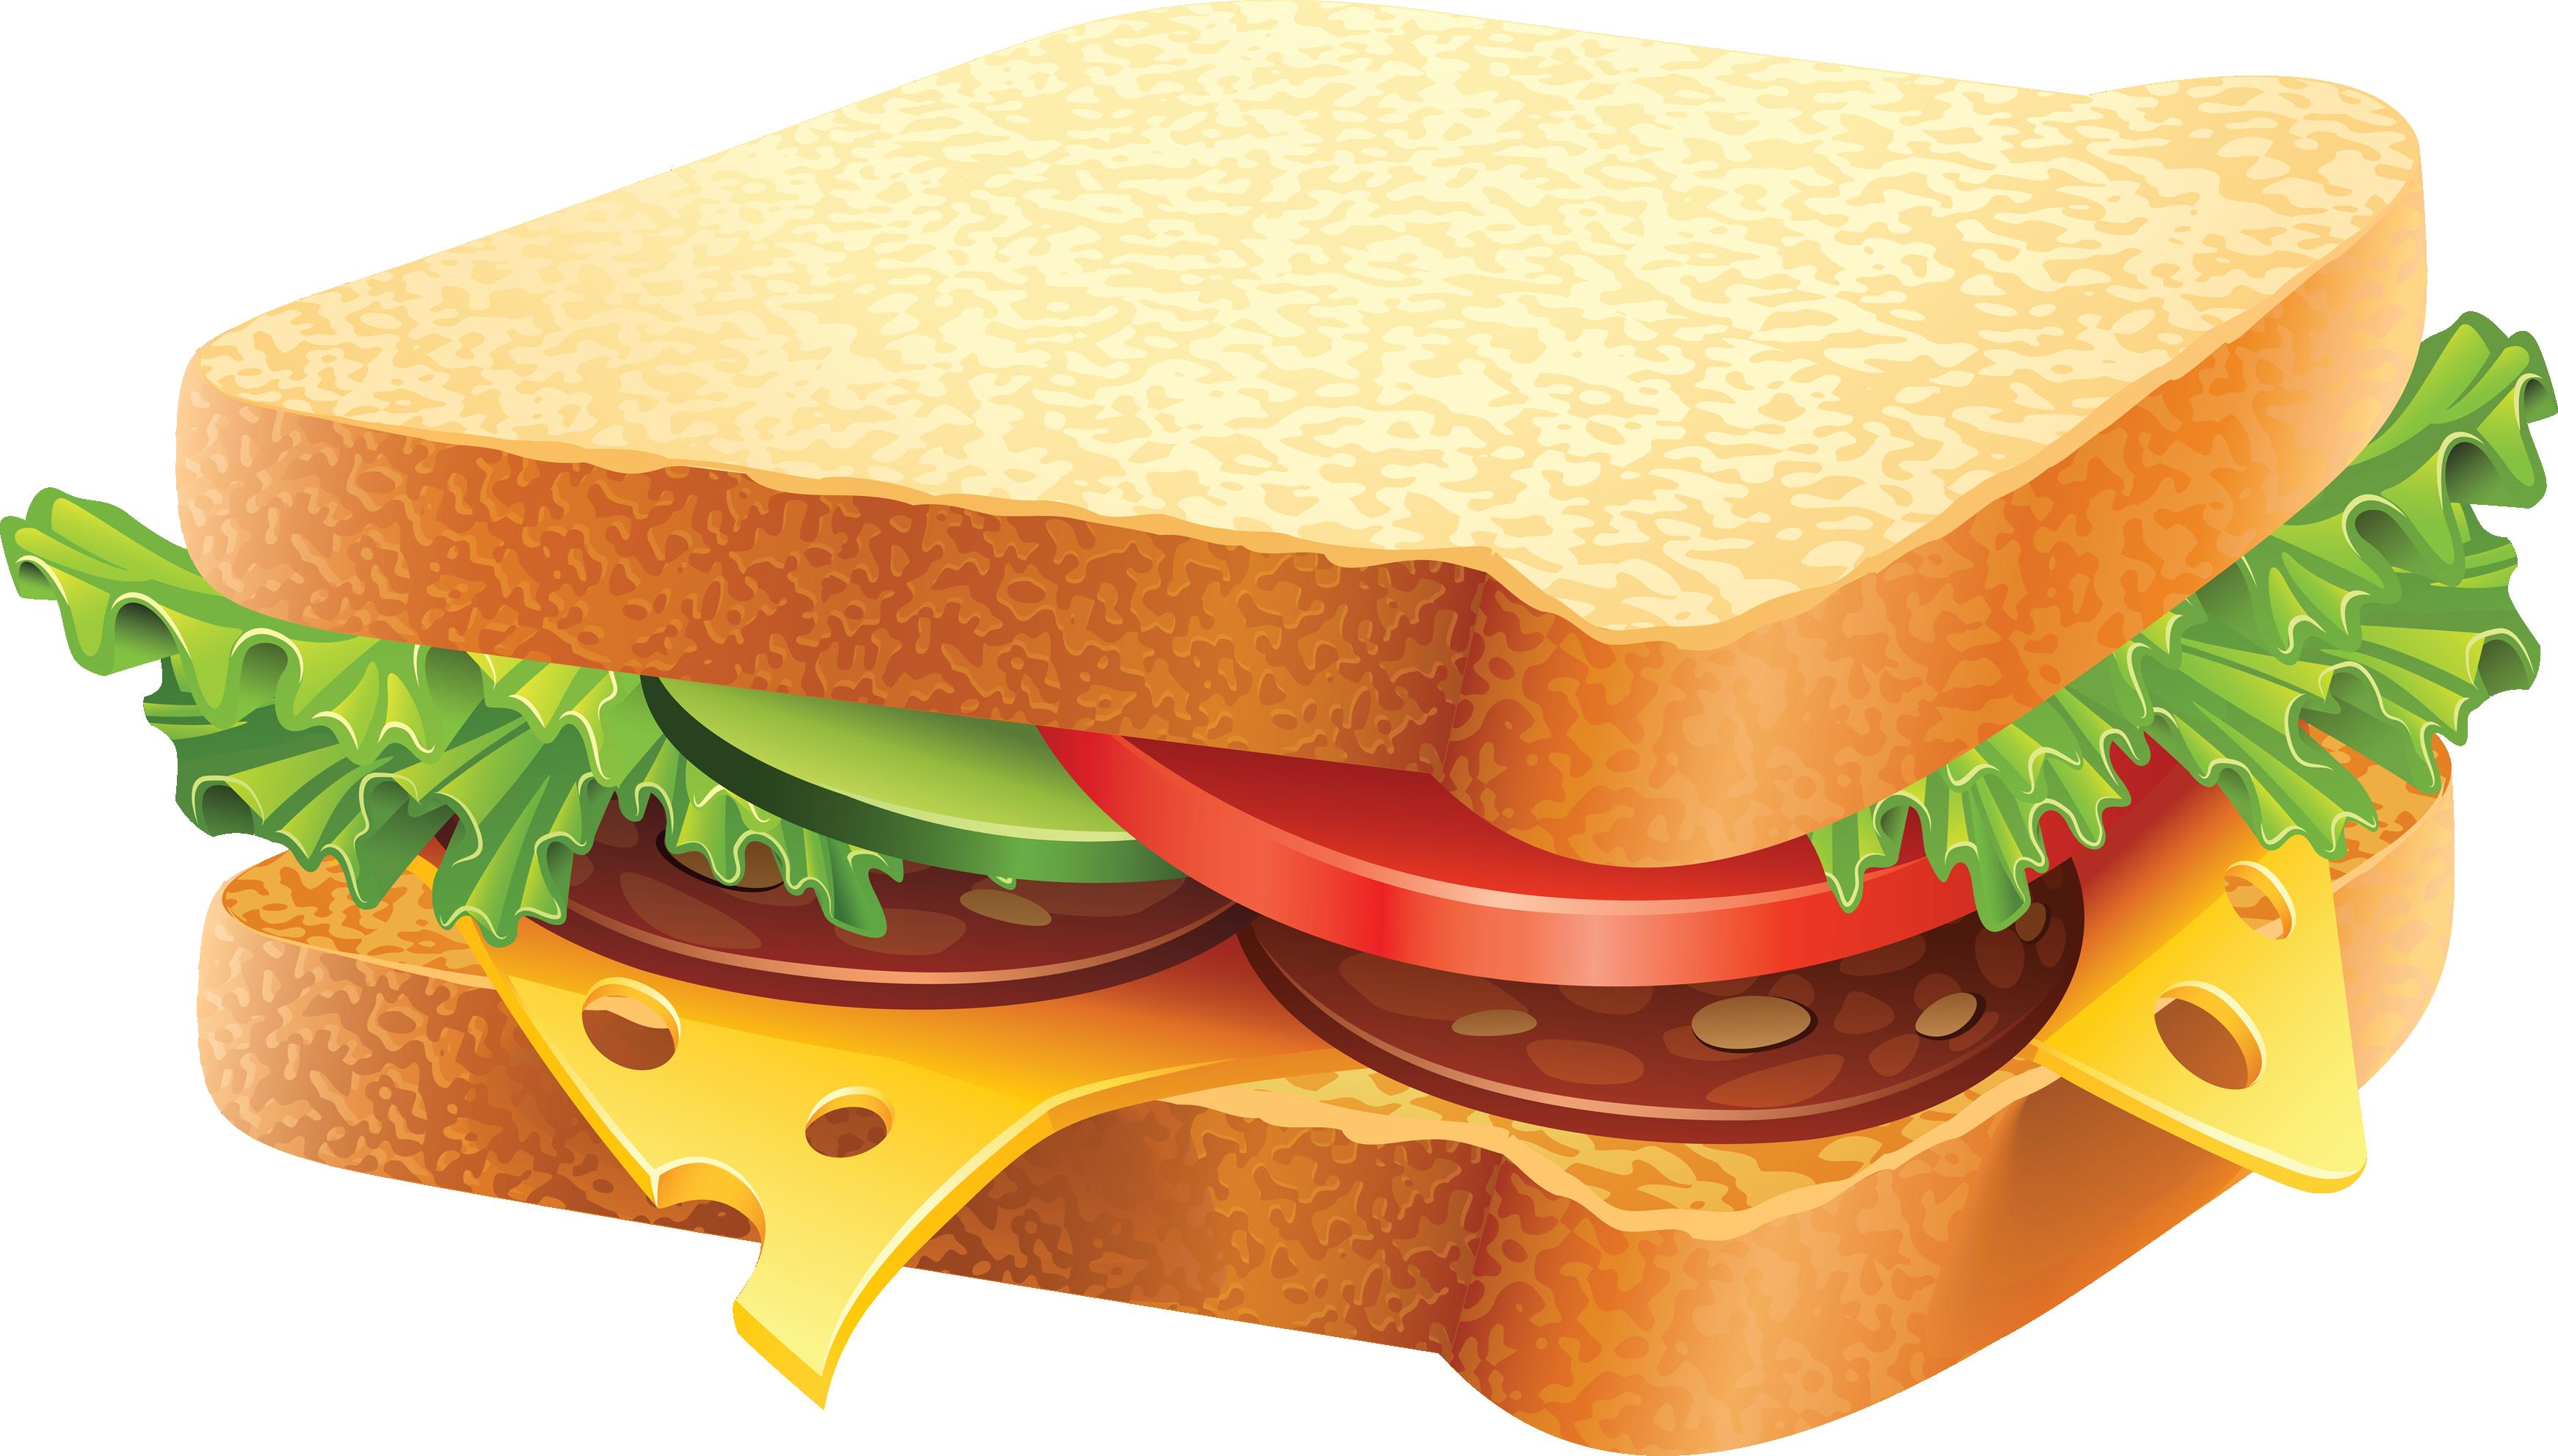 Sandwich Clip Art Free Clipart Panda Free Clipart Images Food Clipart Food Summer Sandwiches